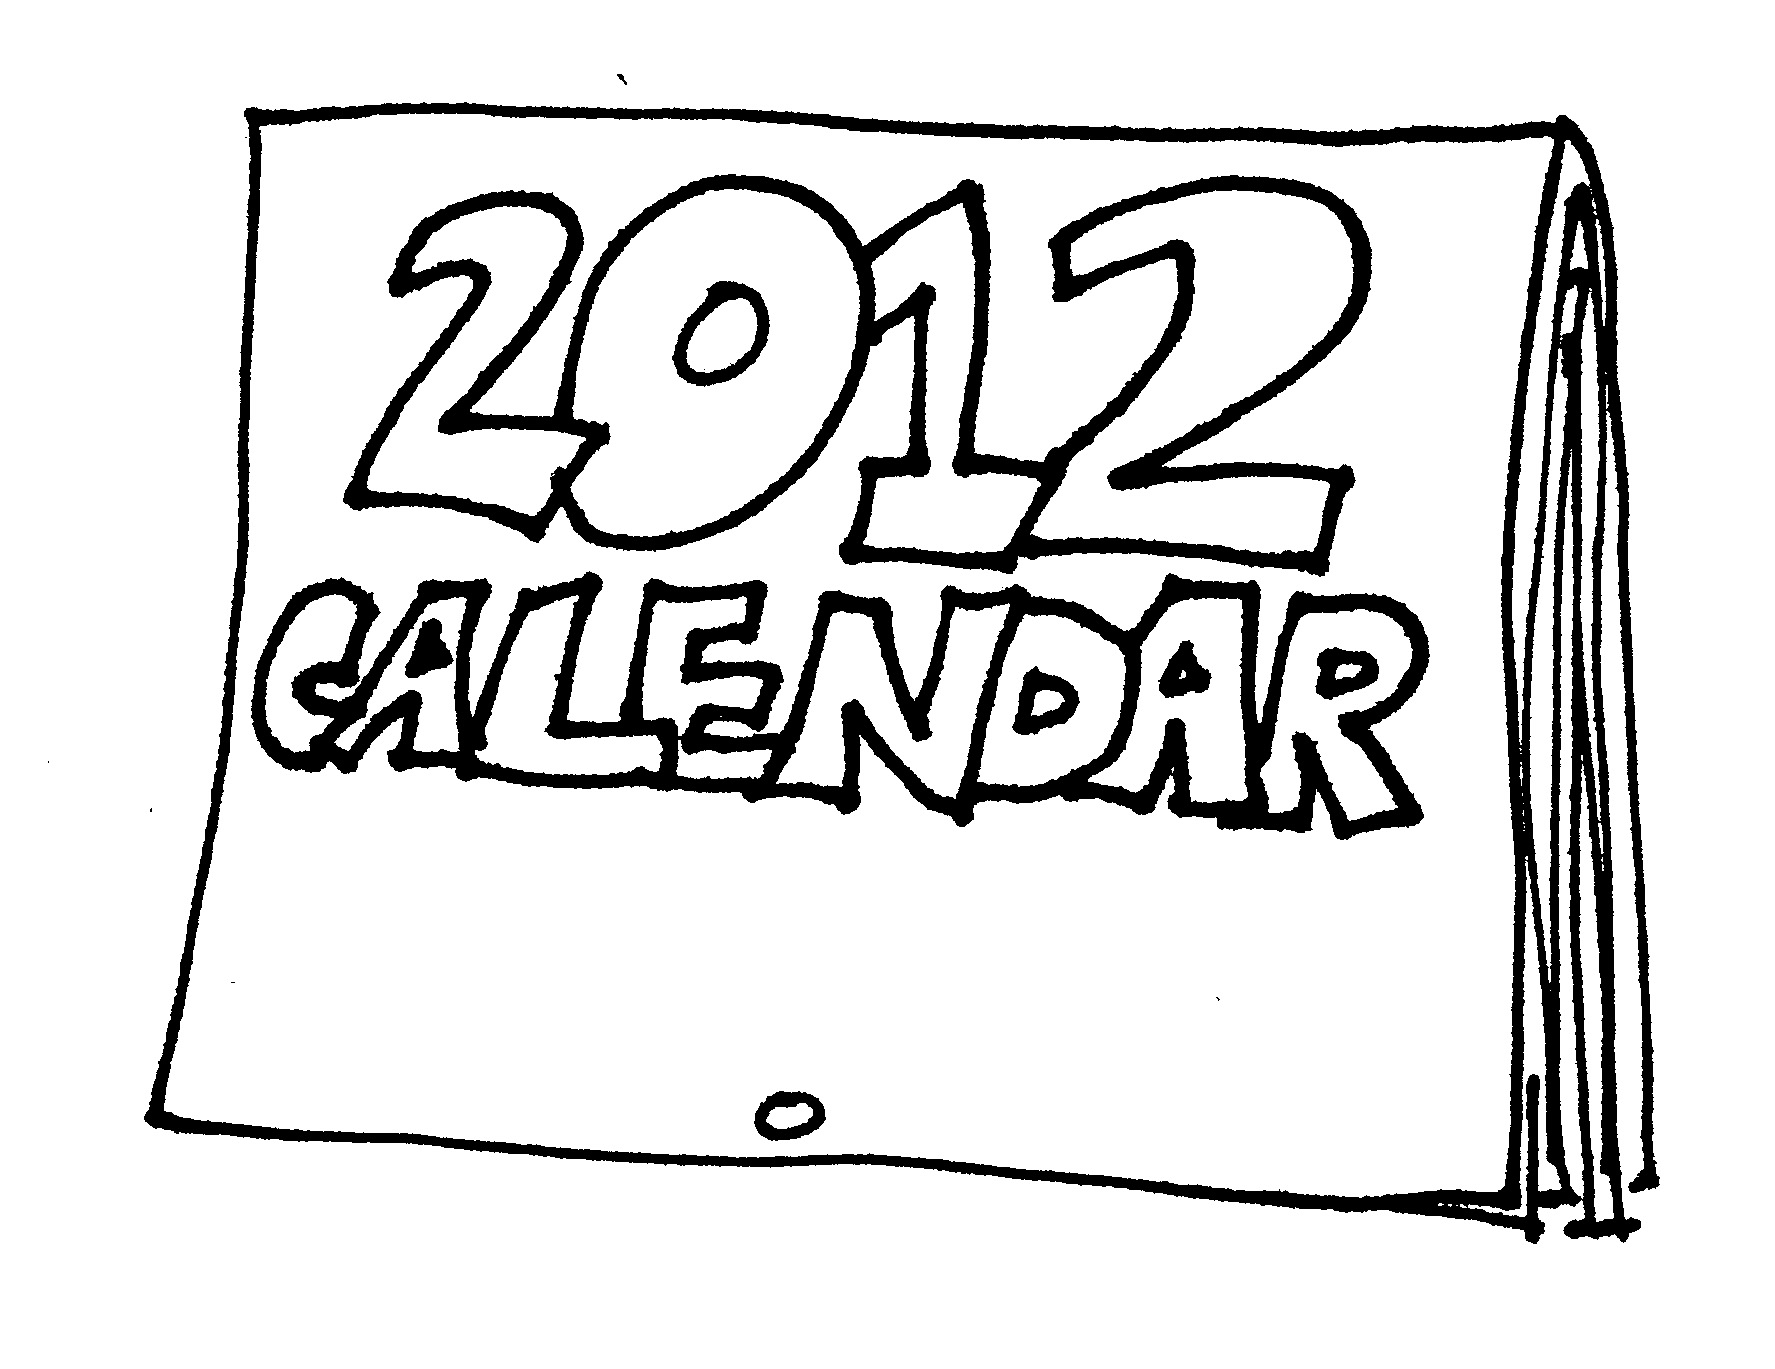 2012 calendar front for shop